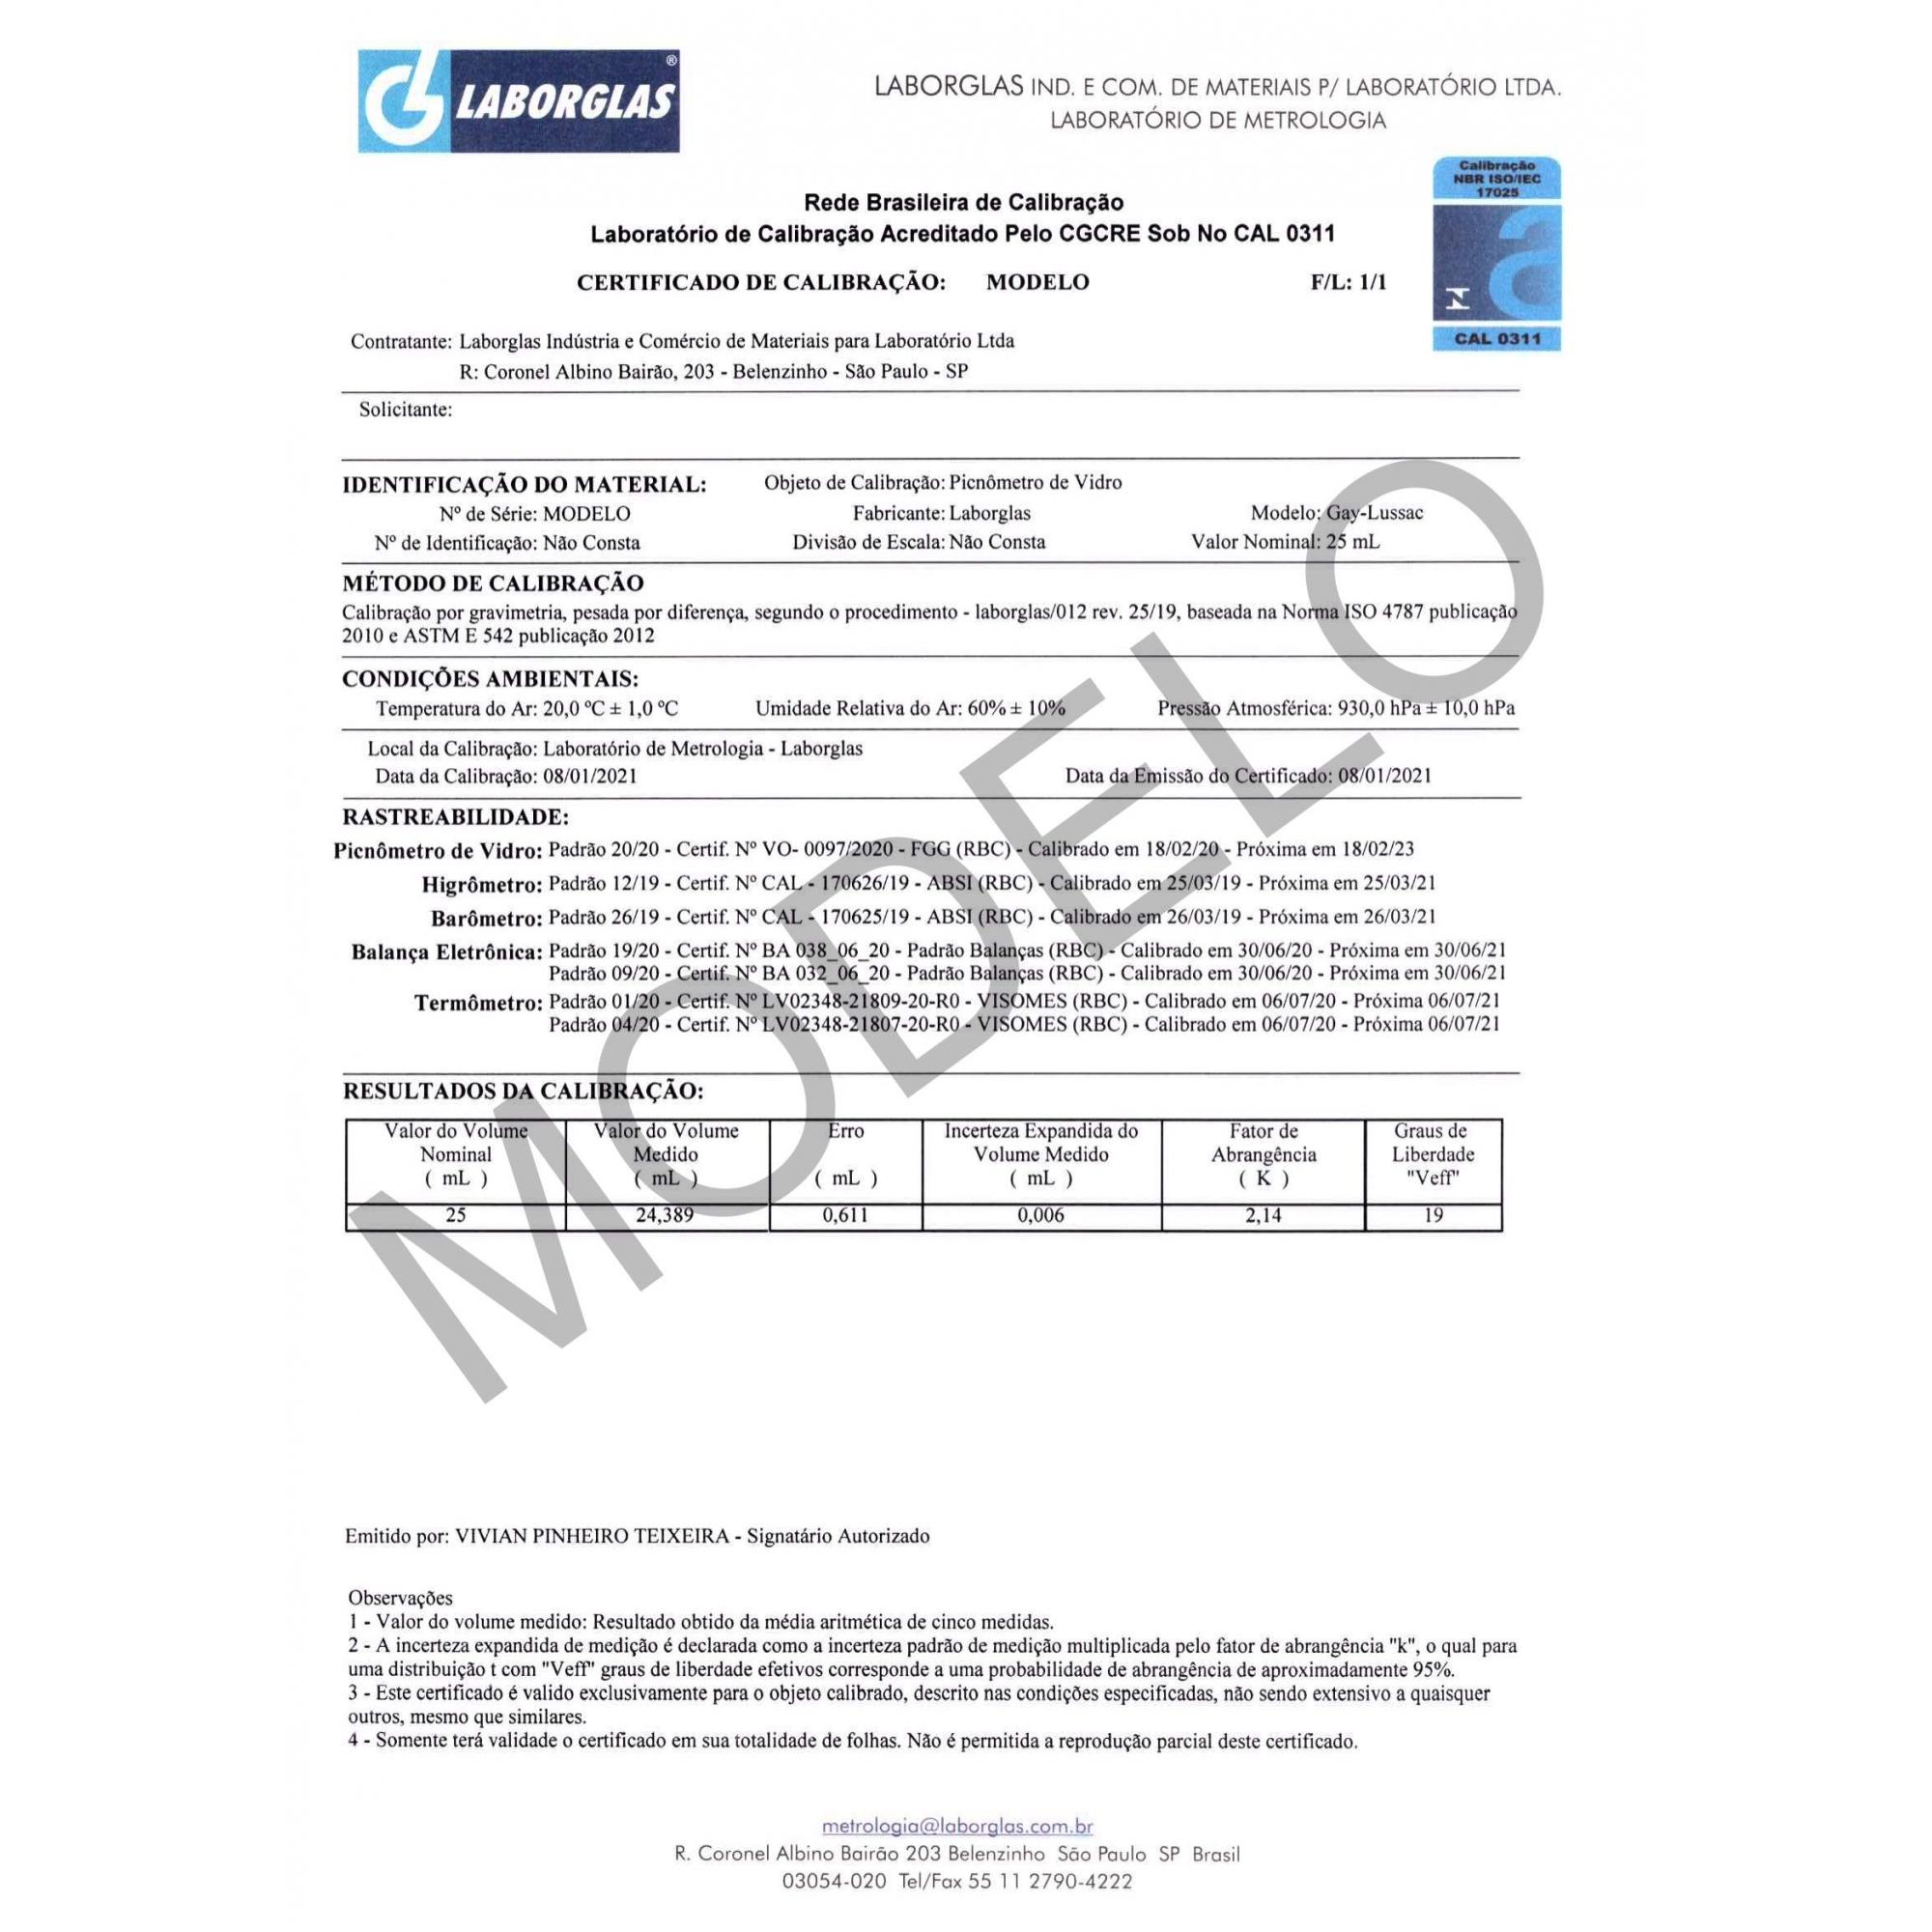 PICNÔMETRO GAY-LUSSAC SEM TERMÔMETRO 50 ML CERTIFICADO RBC - Laborglas - Cód. 9491117-R